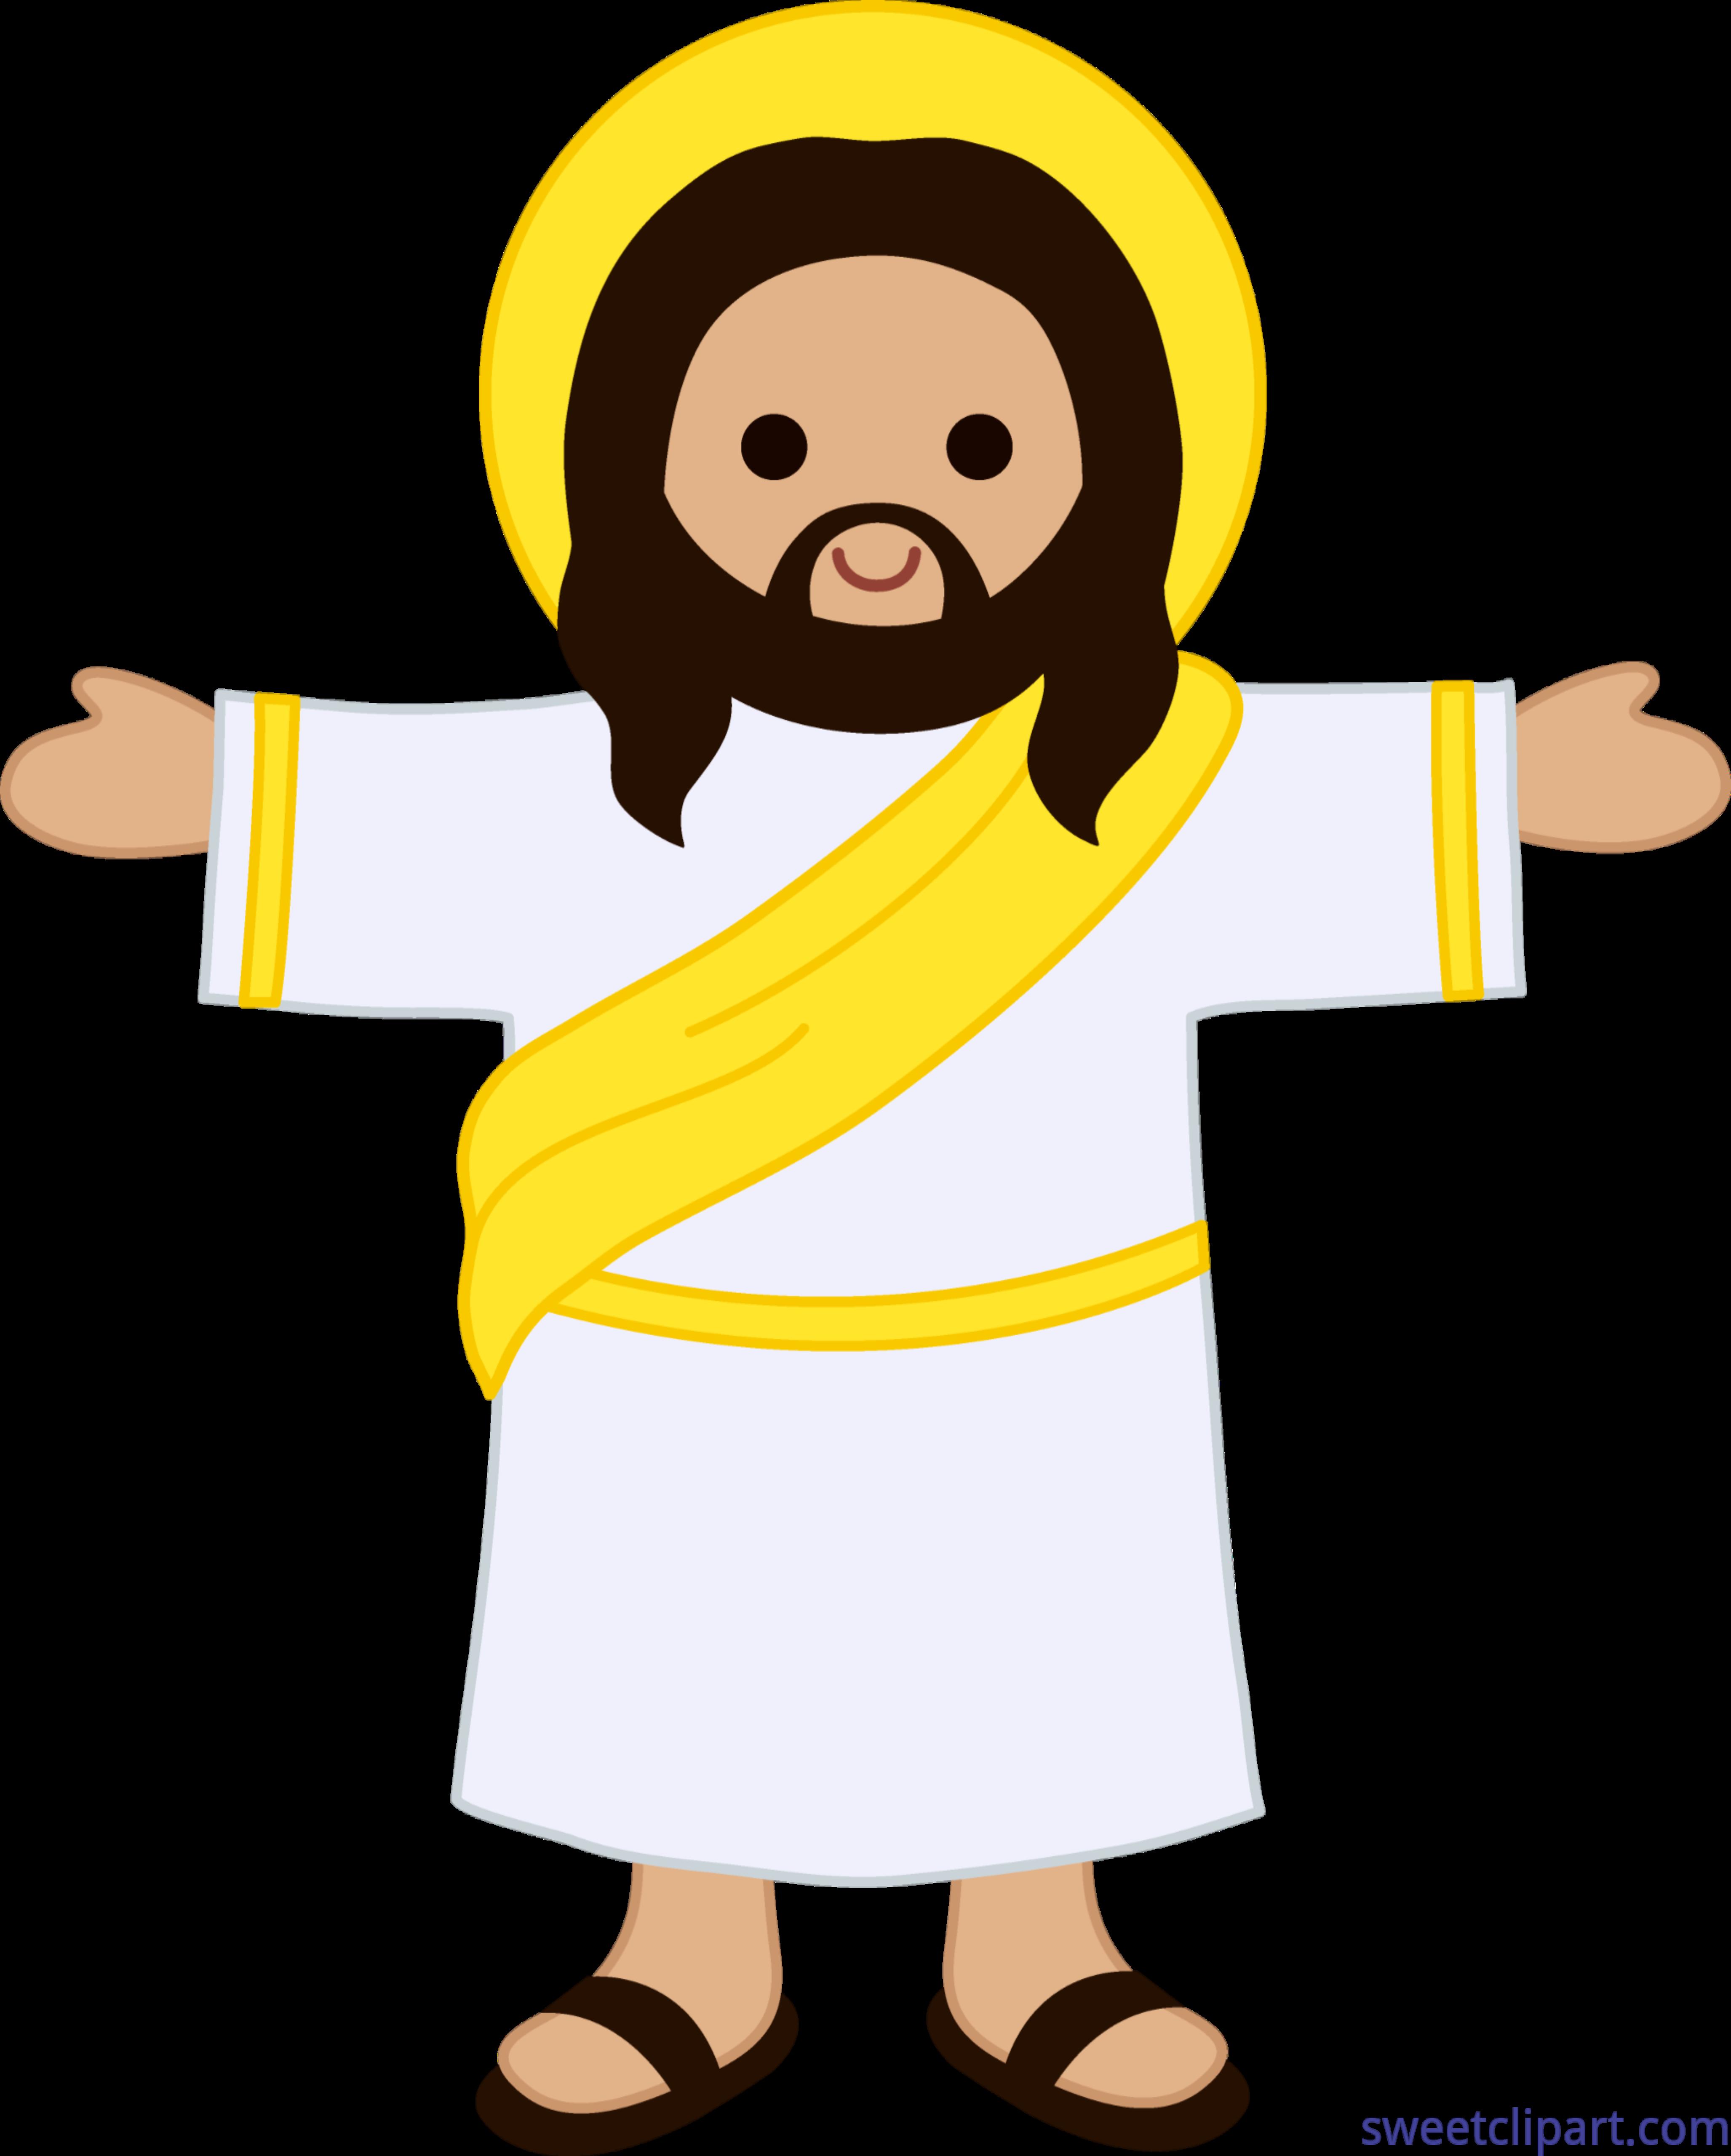 cute jesus christ clip art sweet clip art rh m sweetclipart com jesus christ clipart jesus christ clipart